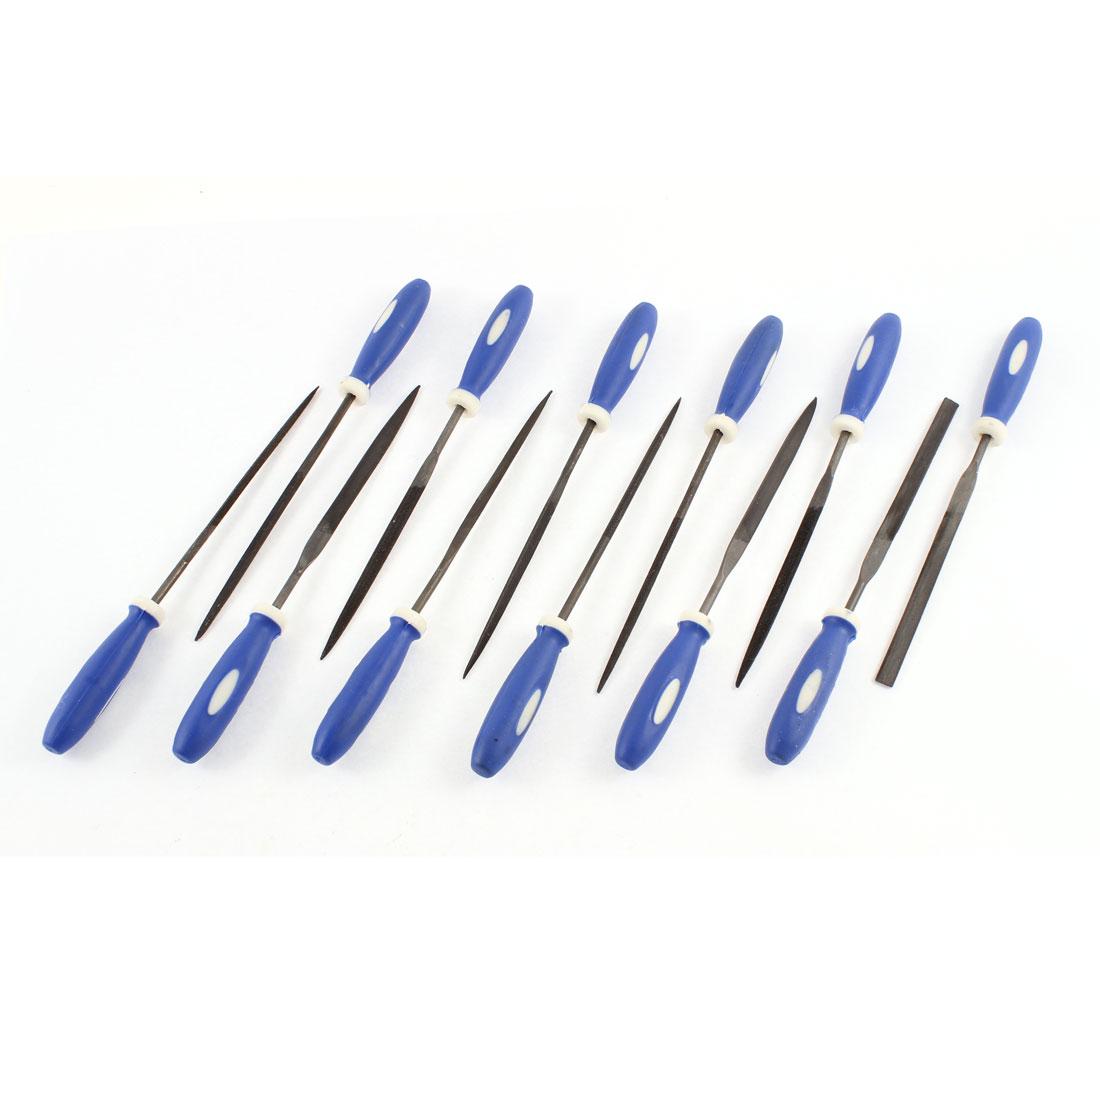 Metal Glass Stone Jewelry Wood Carving Craft Needle Mini Files Set 12 Pcs